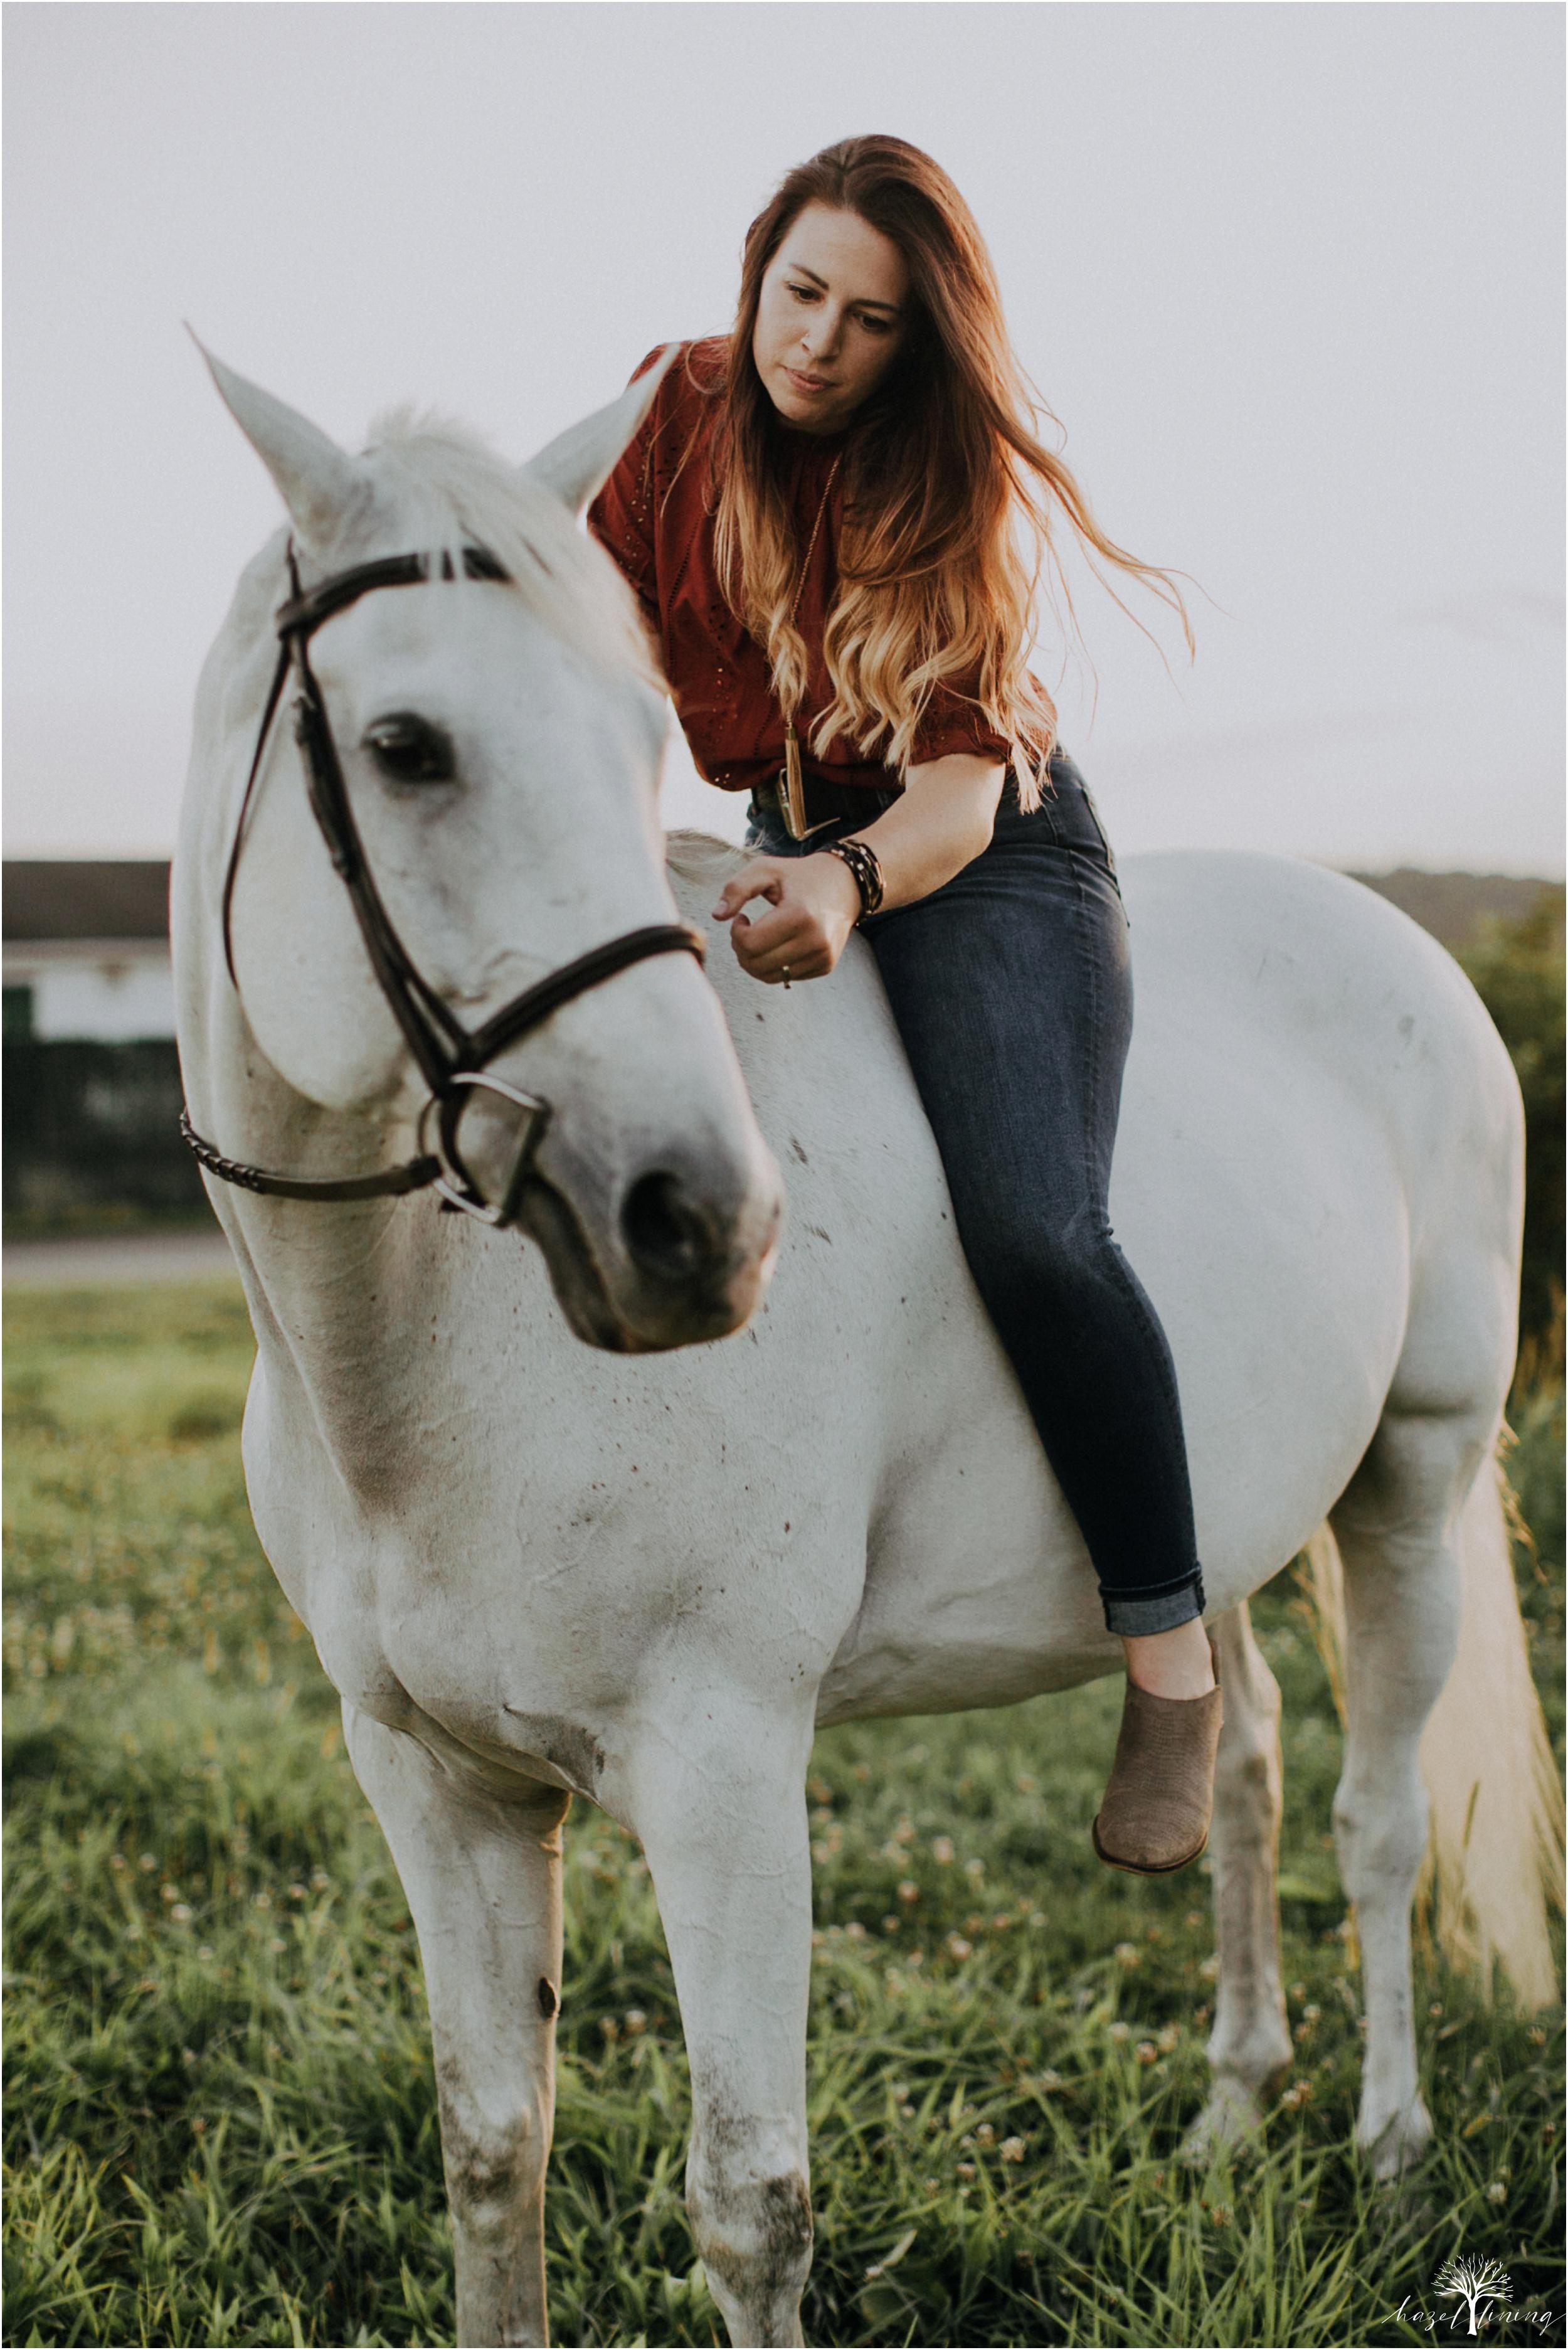 taylor-adams-and-horse-delaware-valley-university-delval-summer-equestrian-portrait-session-hazel-lining-photography-destination-elopement-wedding-engagement-photography_0033.jpg